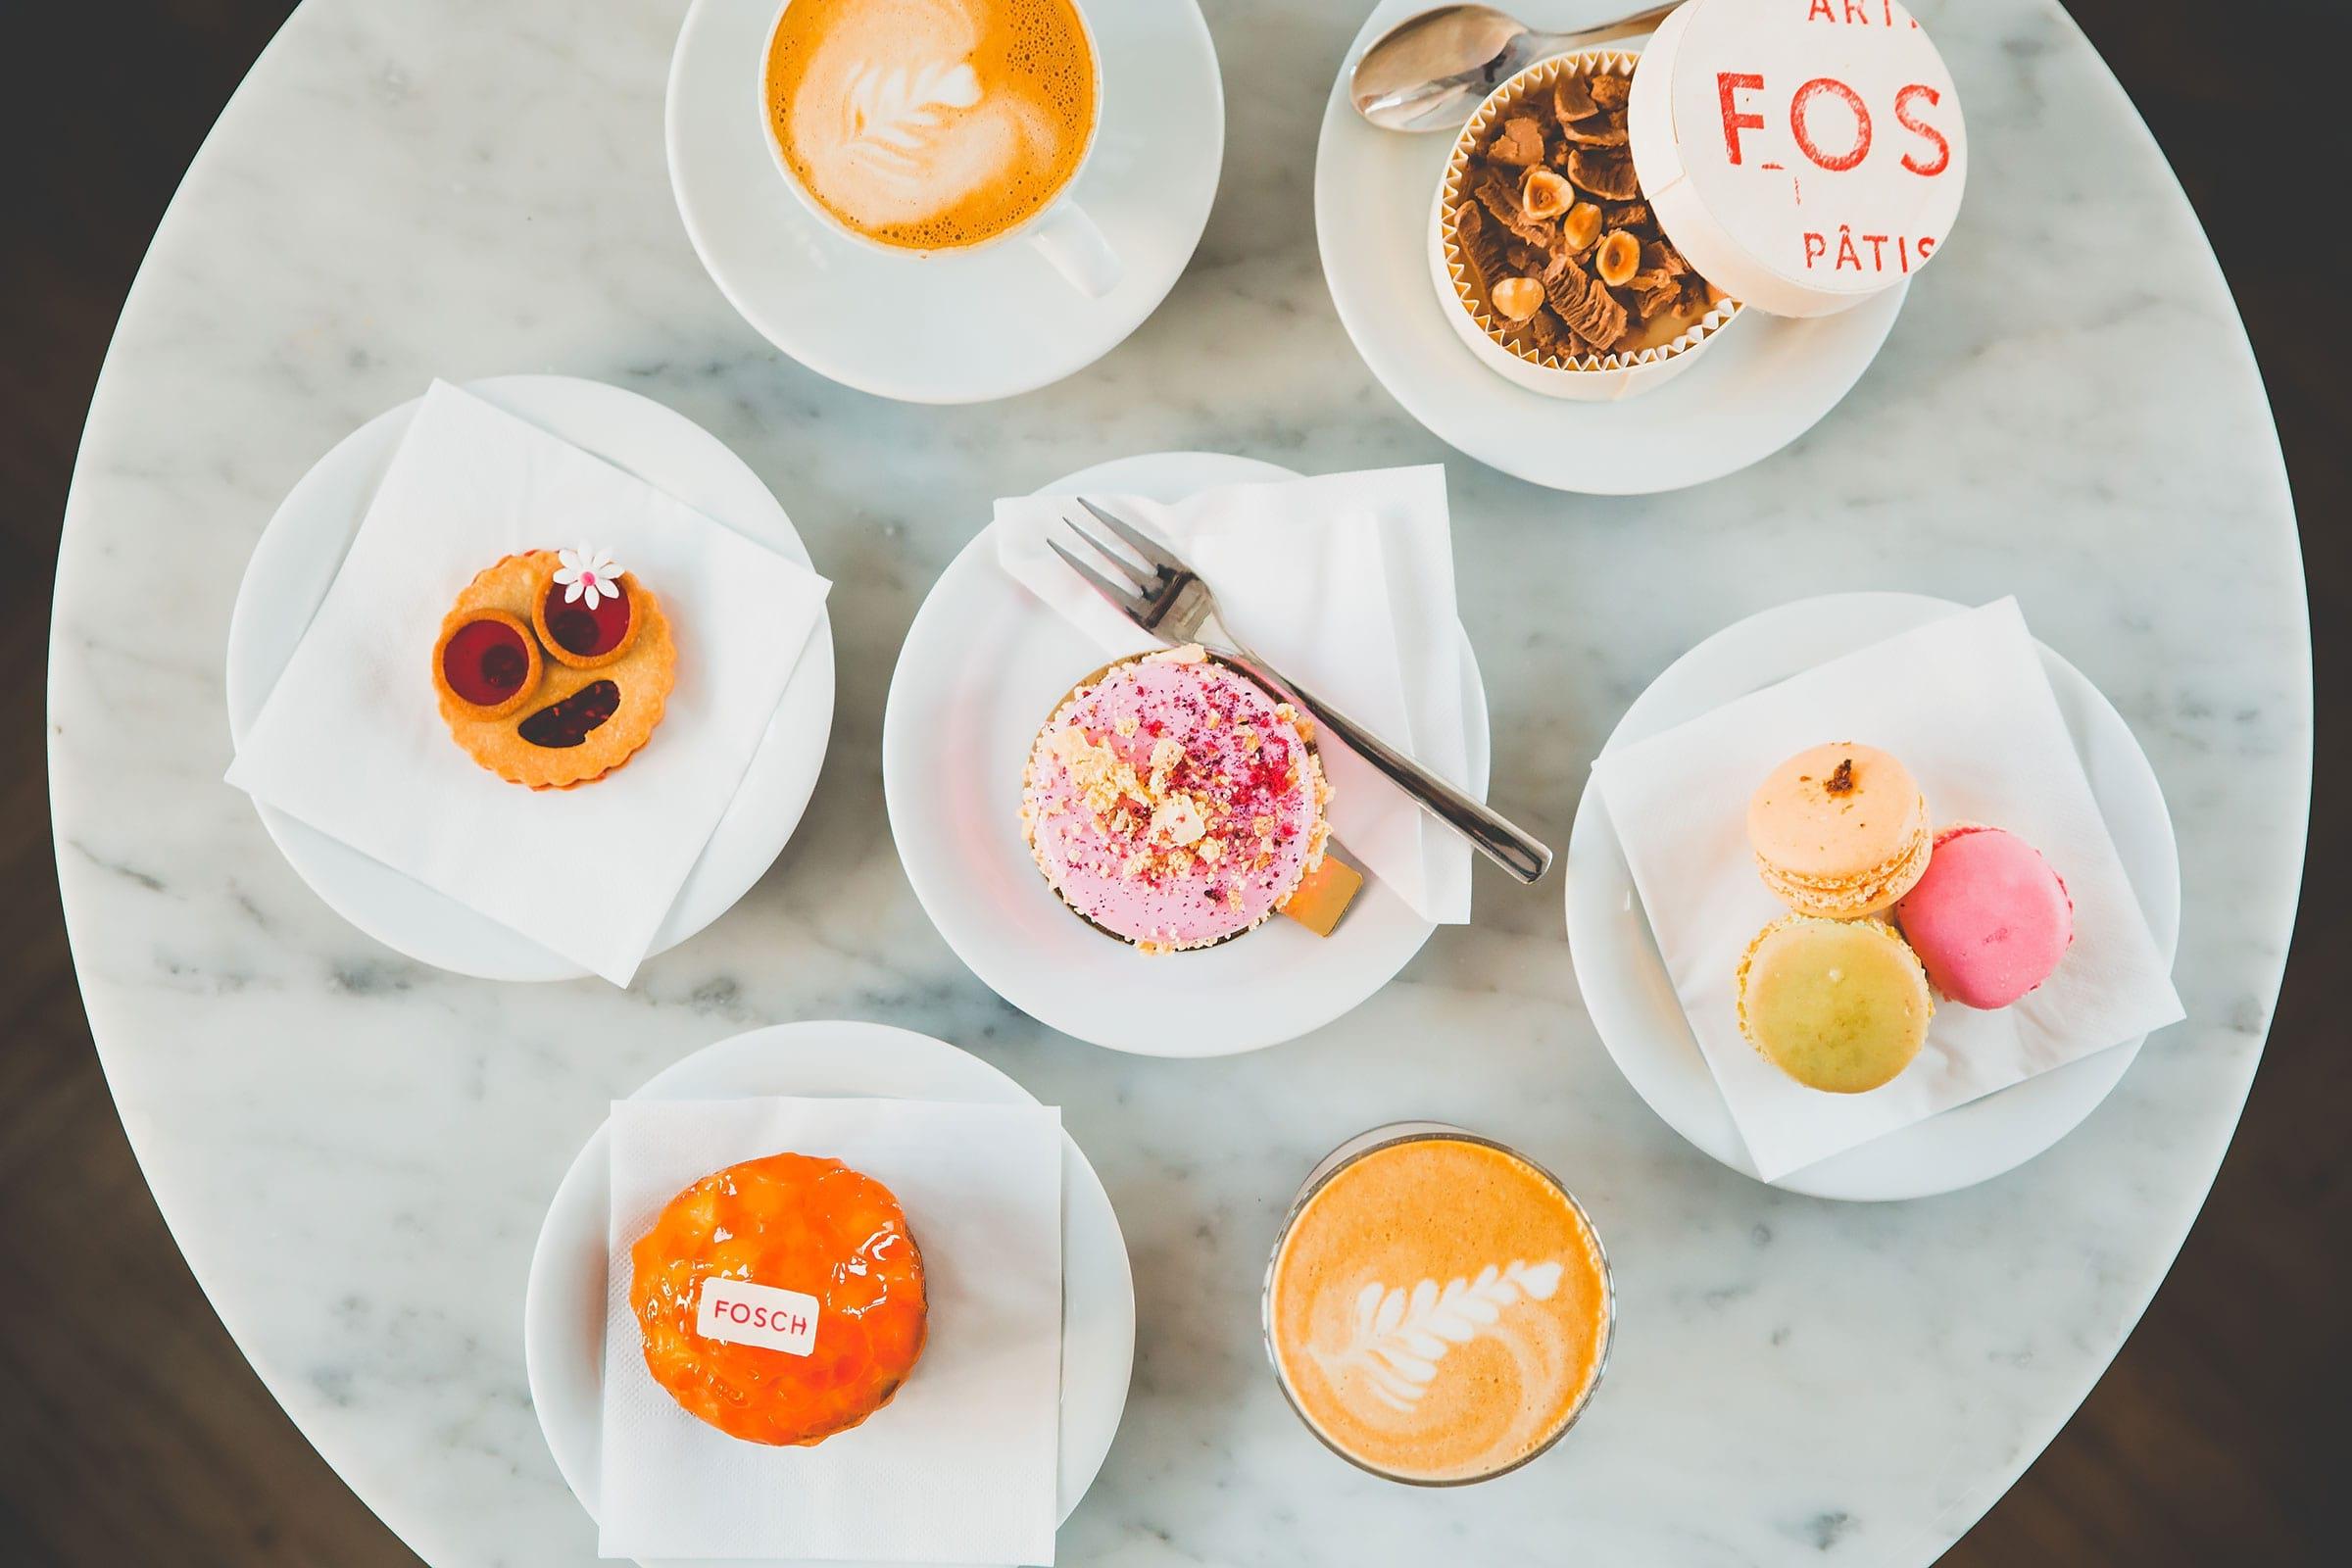 Fosch Artisan Pâtisserie